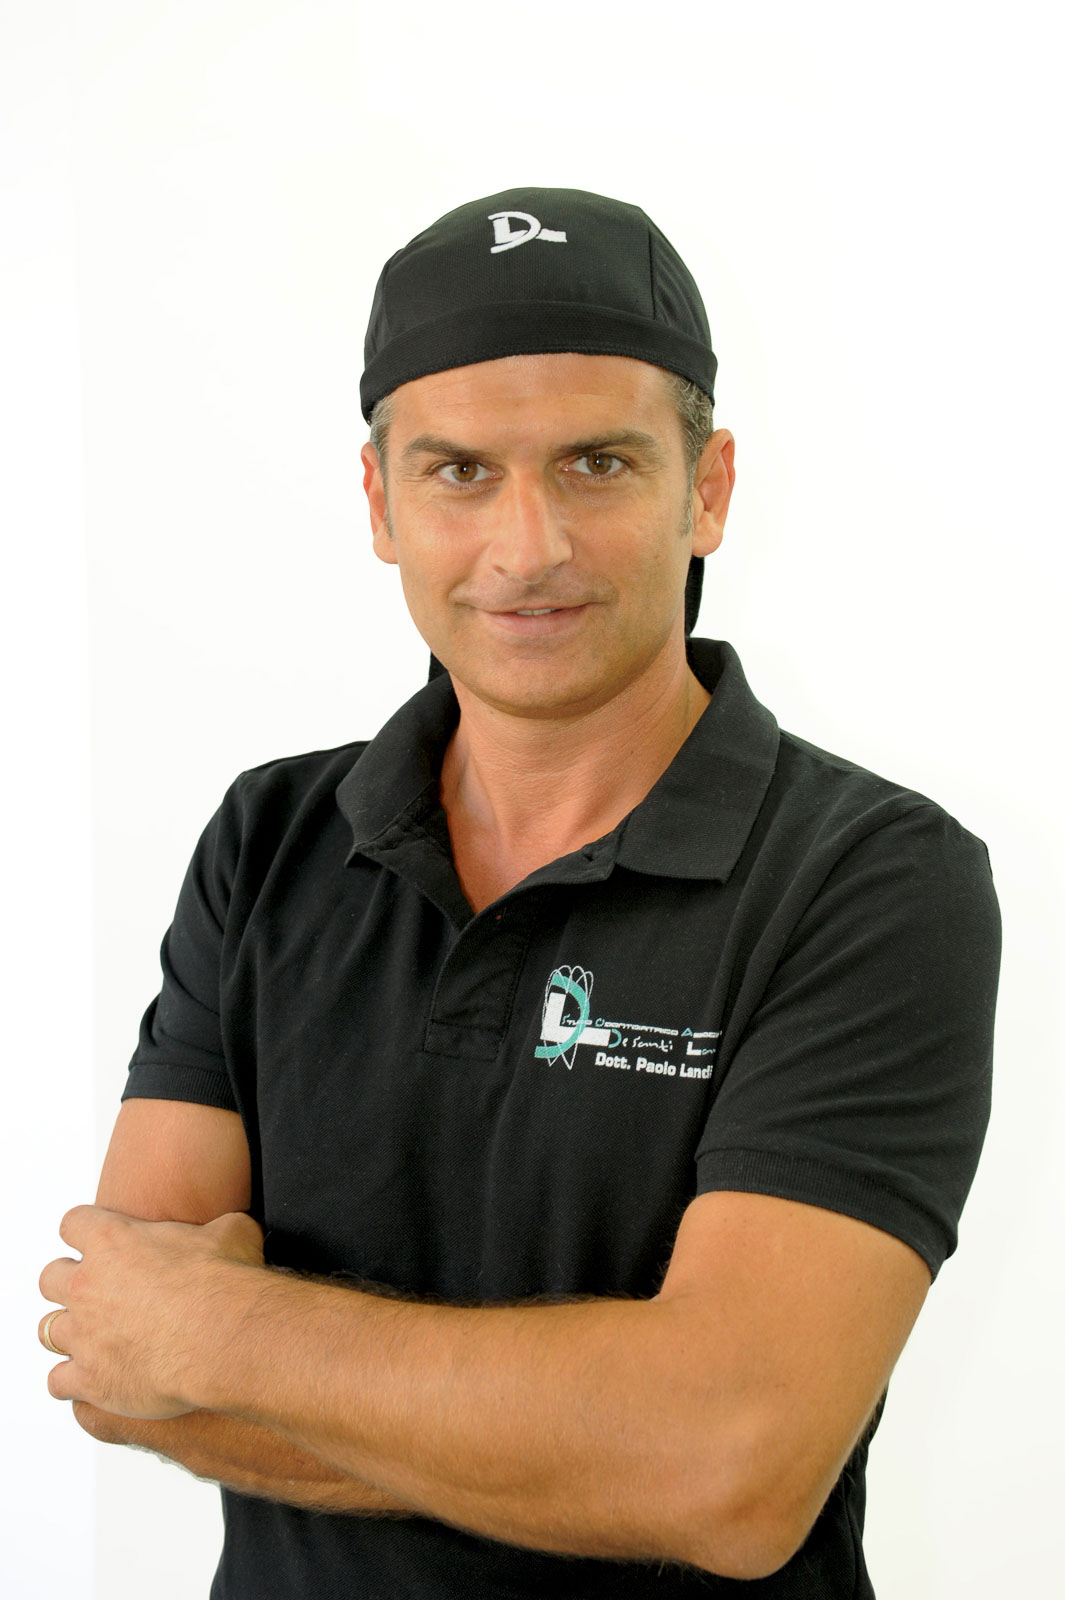 Studio-dentistico-desanti-landi-33